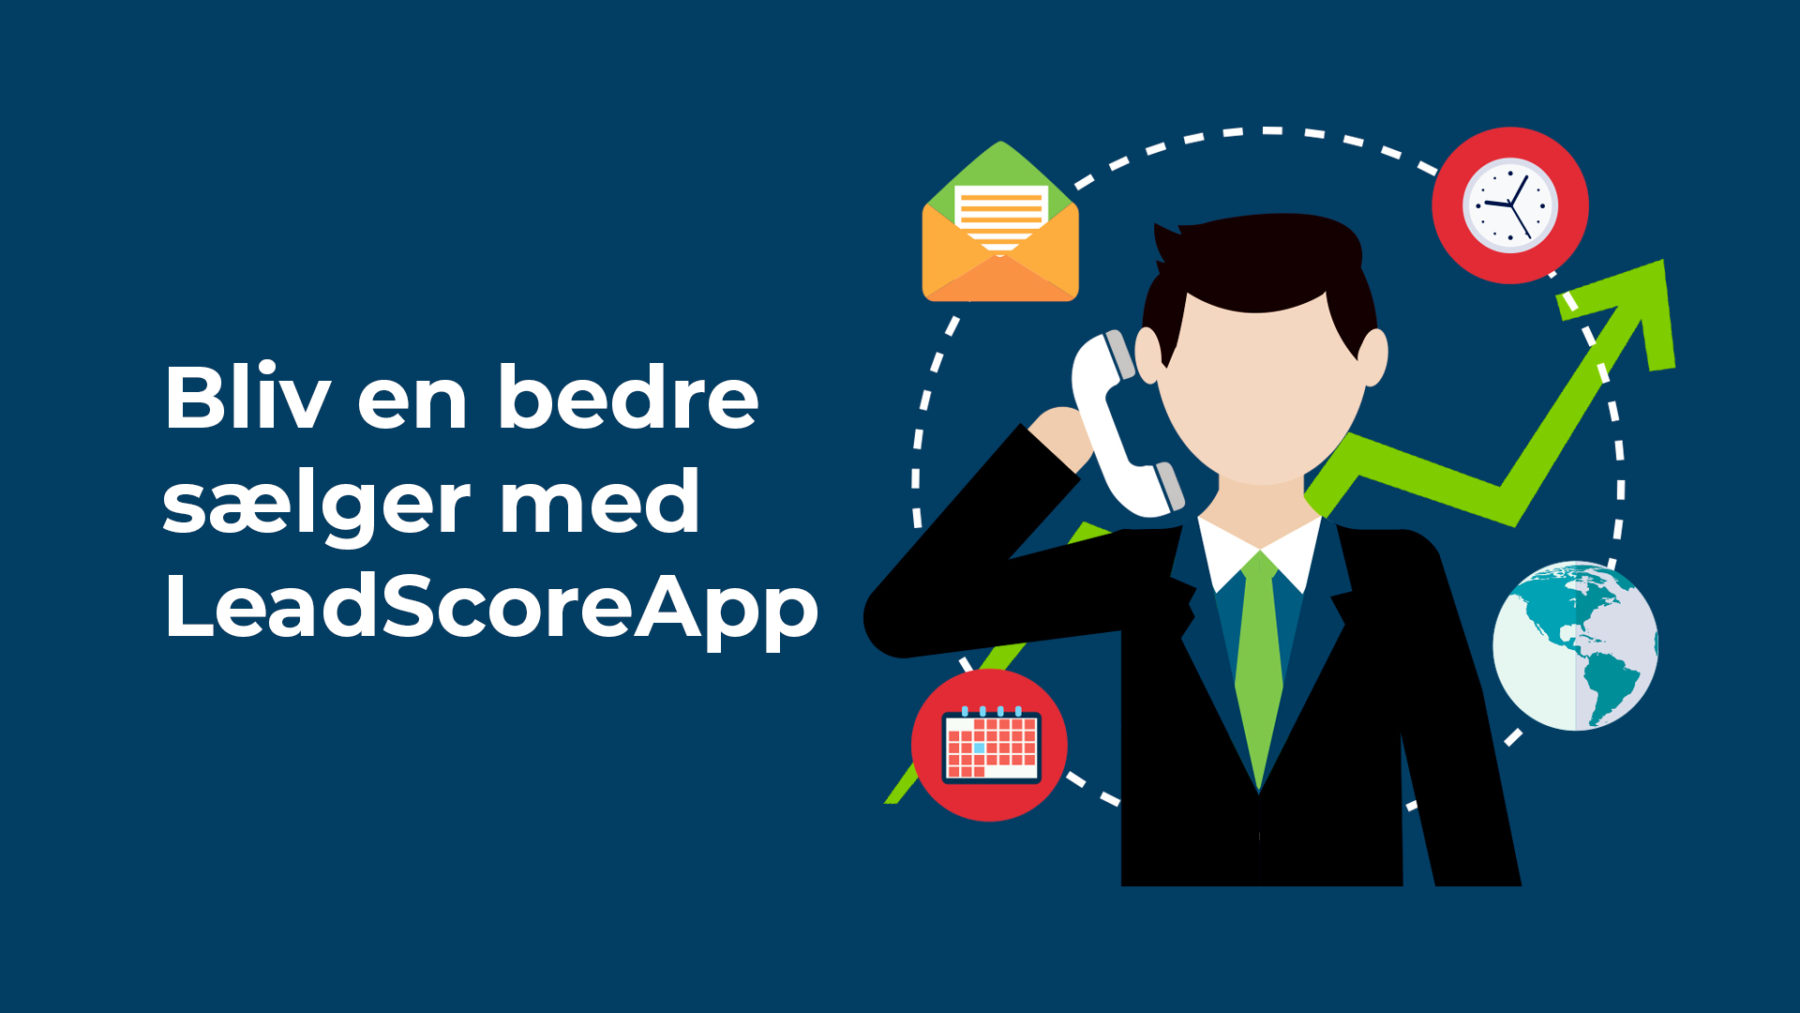 Bliv en bedre sælger med LeadScoreApp